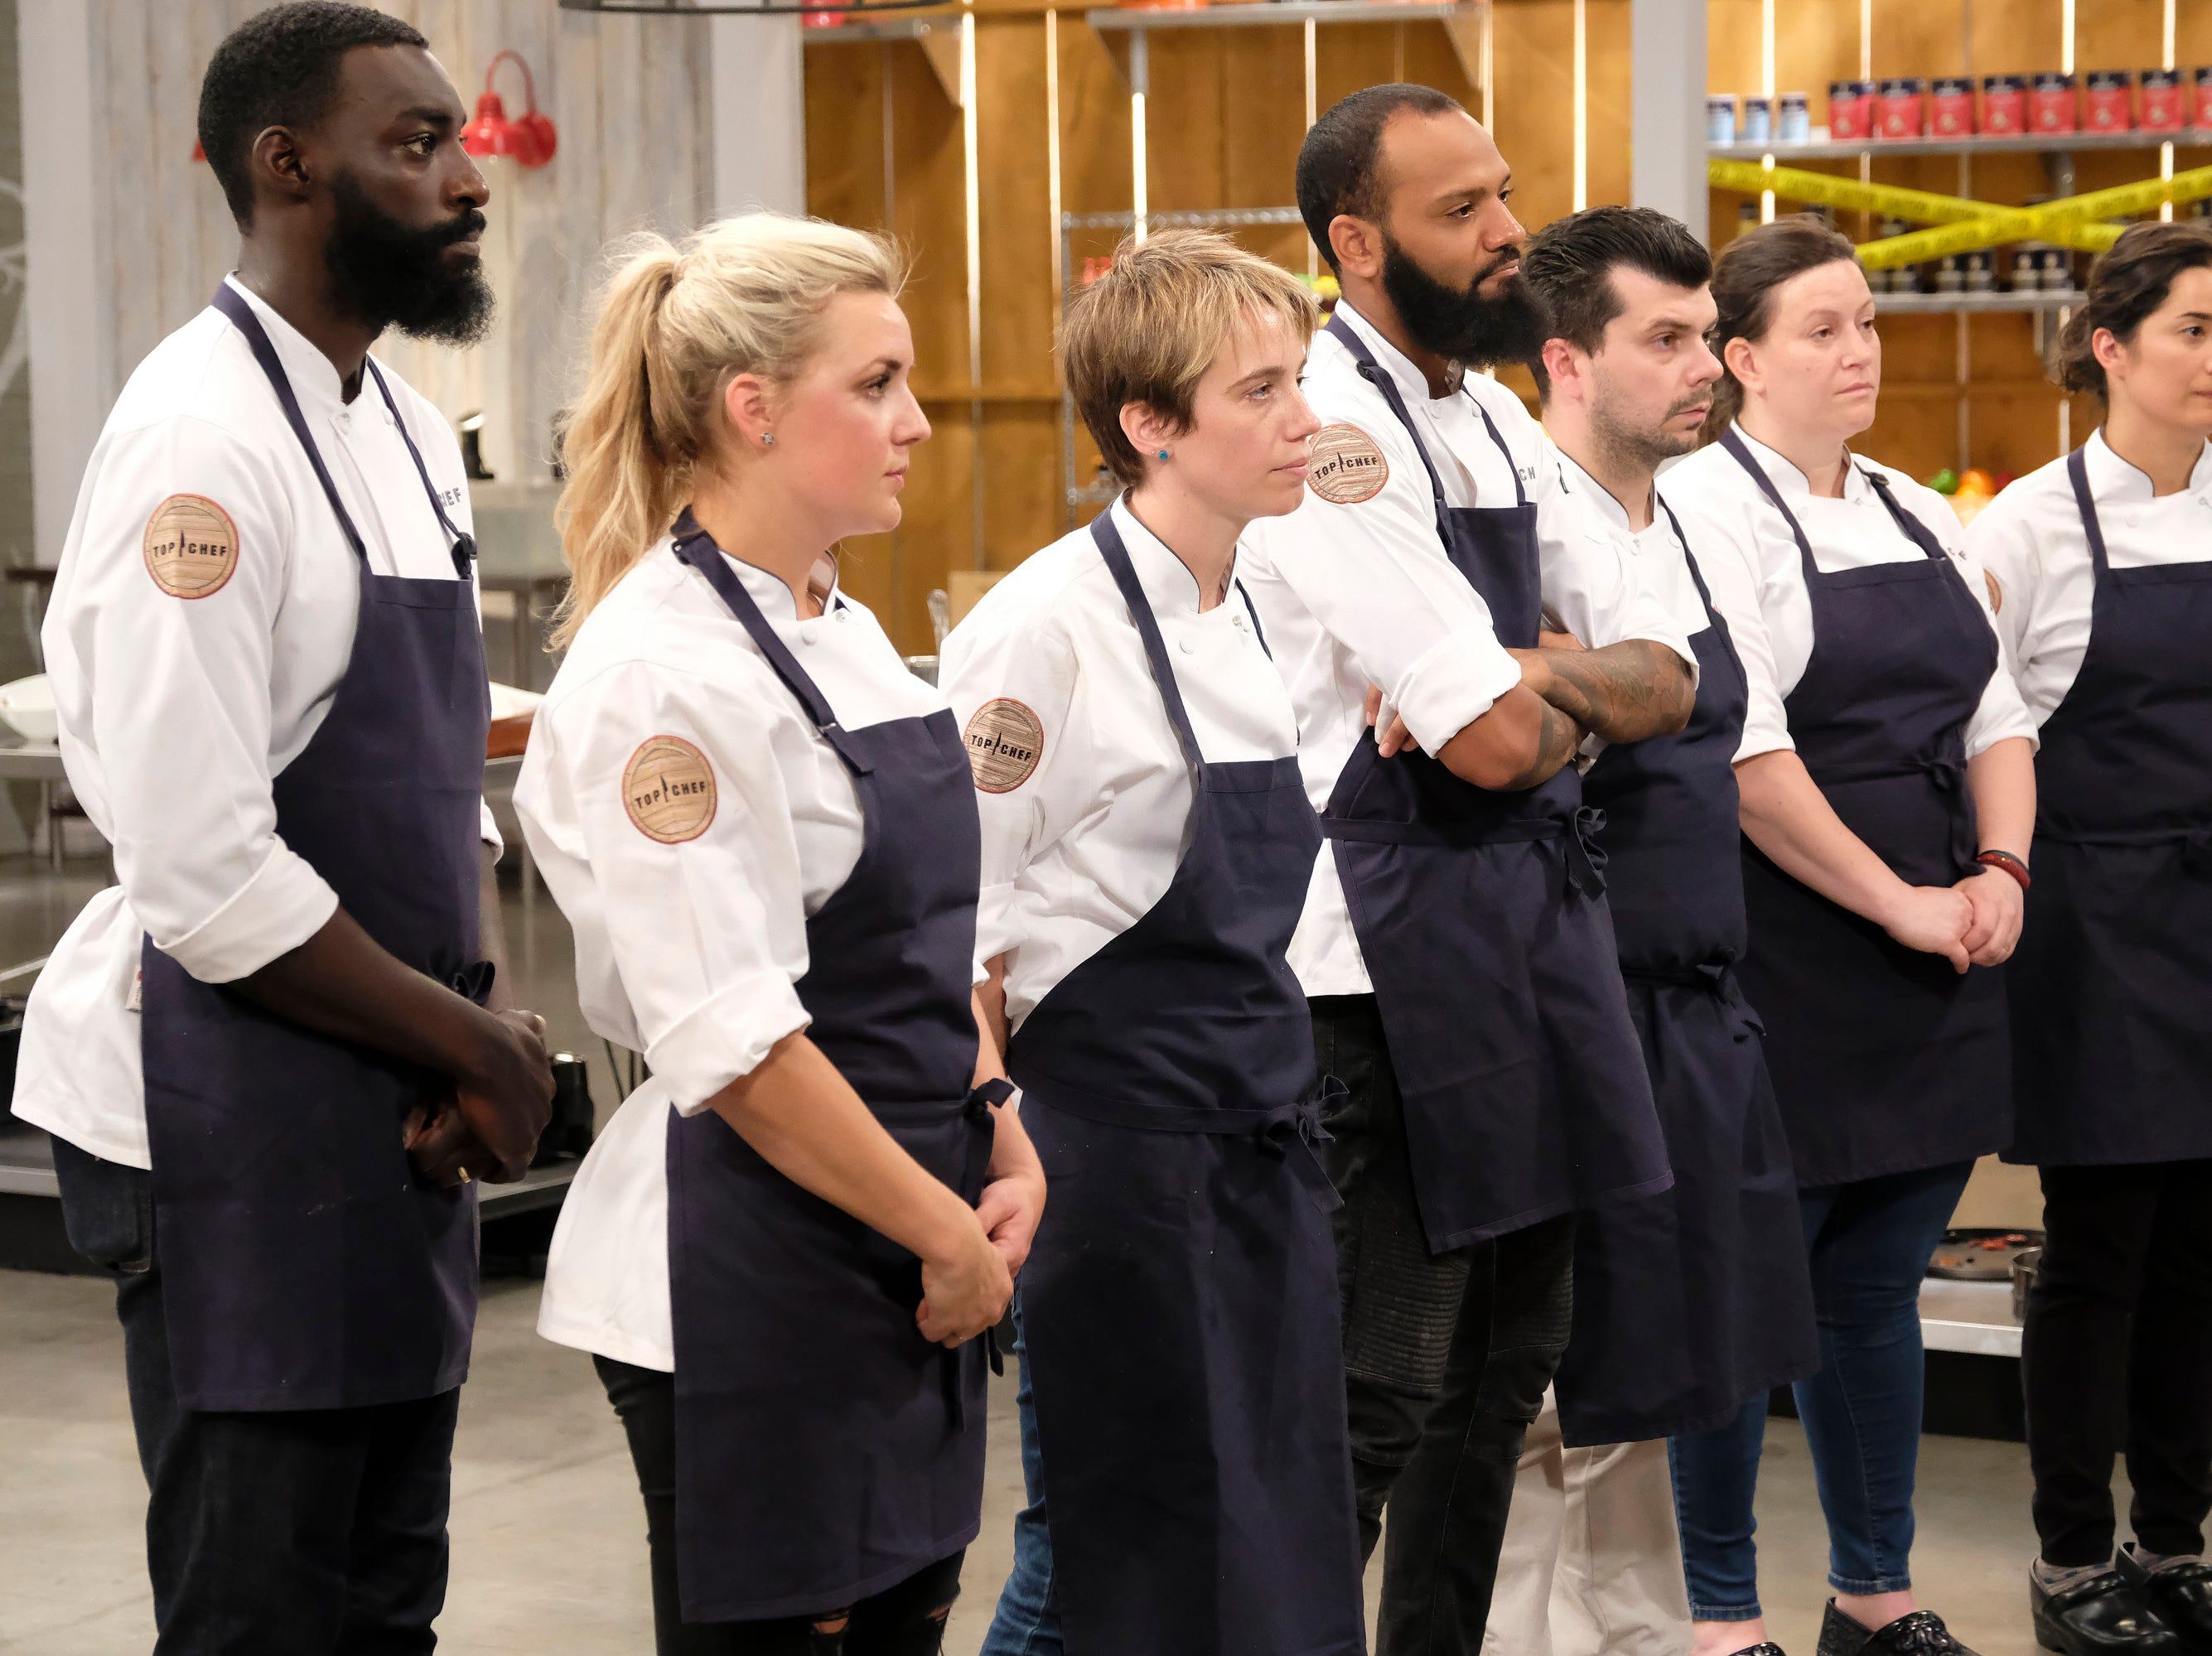 (From left to right): Contestants Eric Adjepong, Kelsey Barnard, Adrienne Wright, Justin Sutherland, Eddie Konrad, Sara Bradley and Michelle Minori on episode 10 of Bravo's 'Top Chef: Kentucky' season.